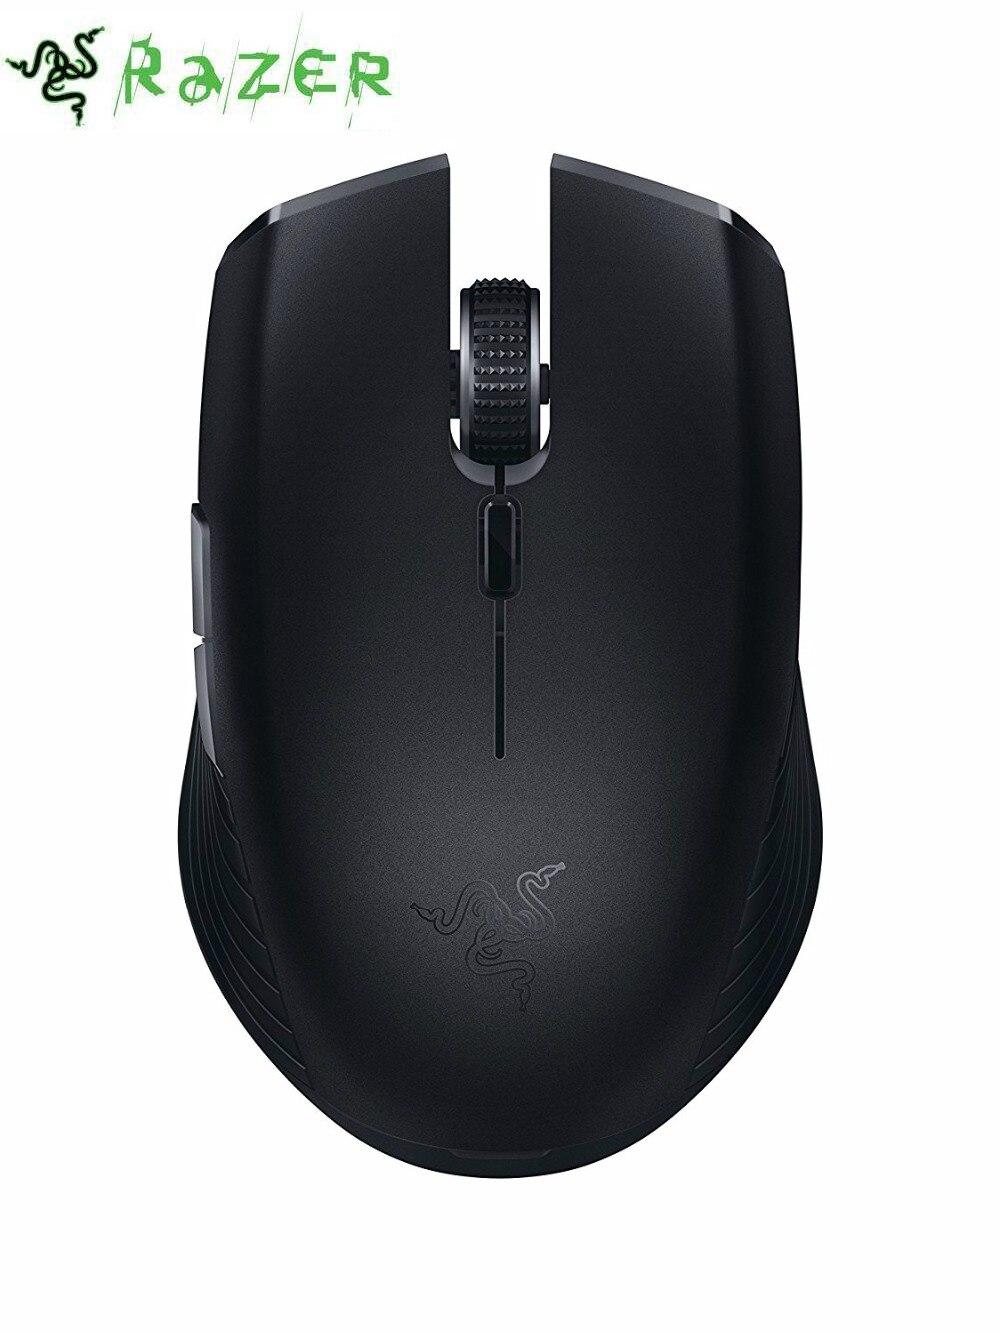 все цены на Razer Atheris - Ambidextrous Bluetooth/2.4Ghz Wireless Portable Gaming Mouse - 7,200 DPI Optical Sensor онлайн